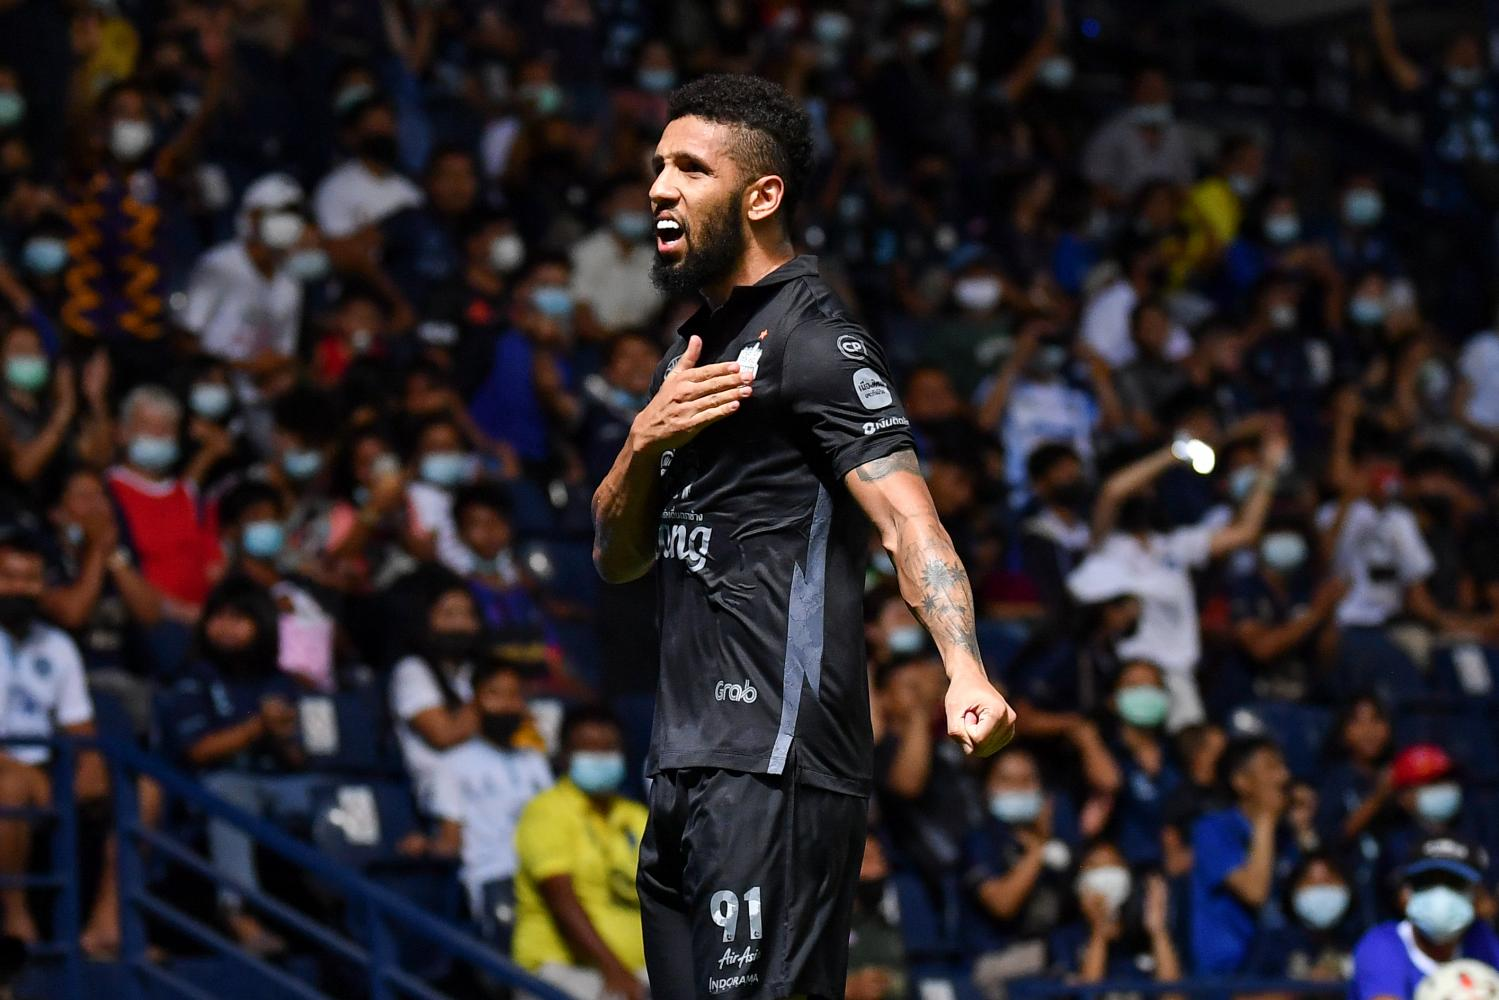 Buriram United's Samuel Rosa reacts after scoring against Muang Thong.